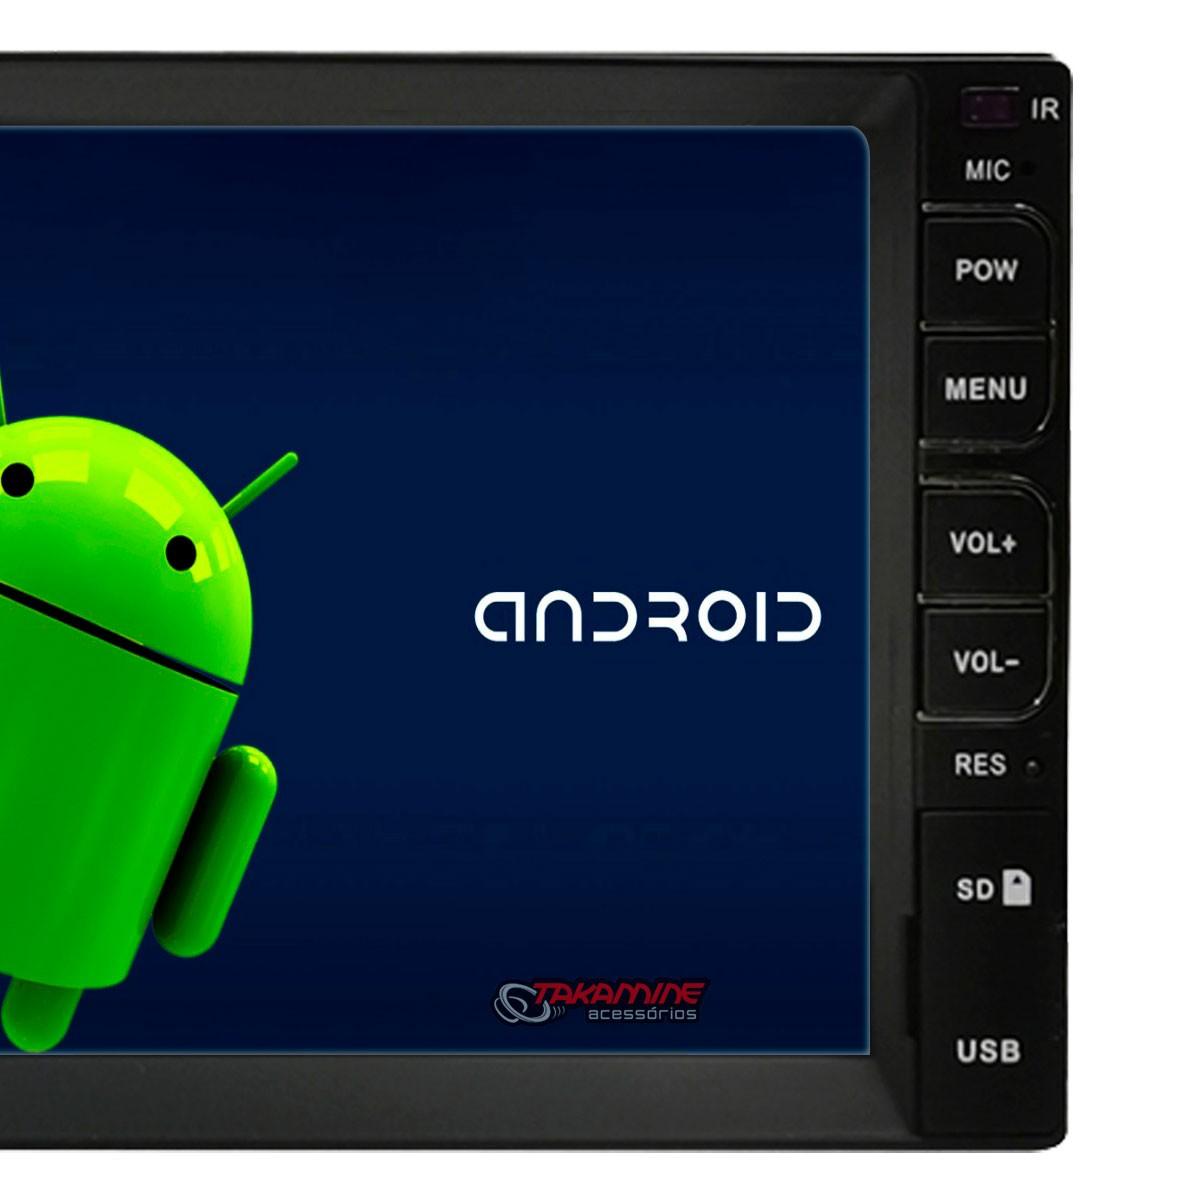 Central multimídia Taytech Android T100 Plus universal GPS, TV Digital e baixe aplicativos